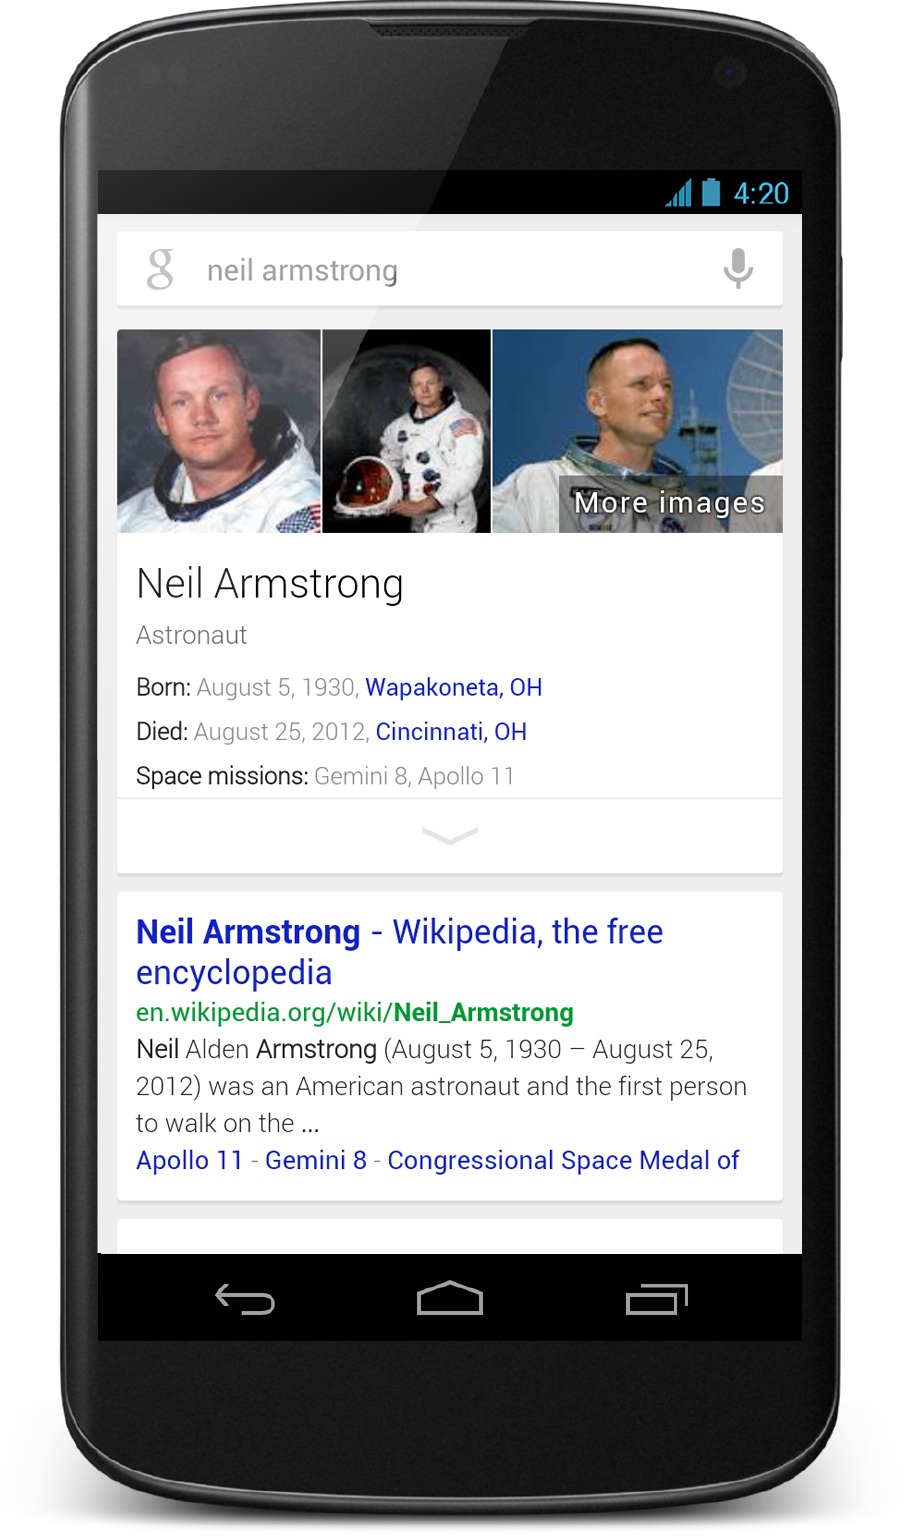 Nexus 4 - Neil Armstrong (1)